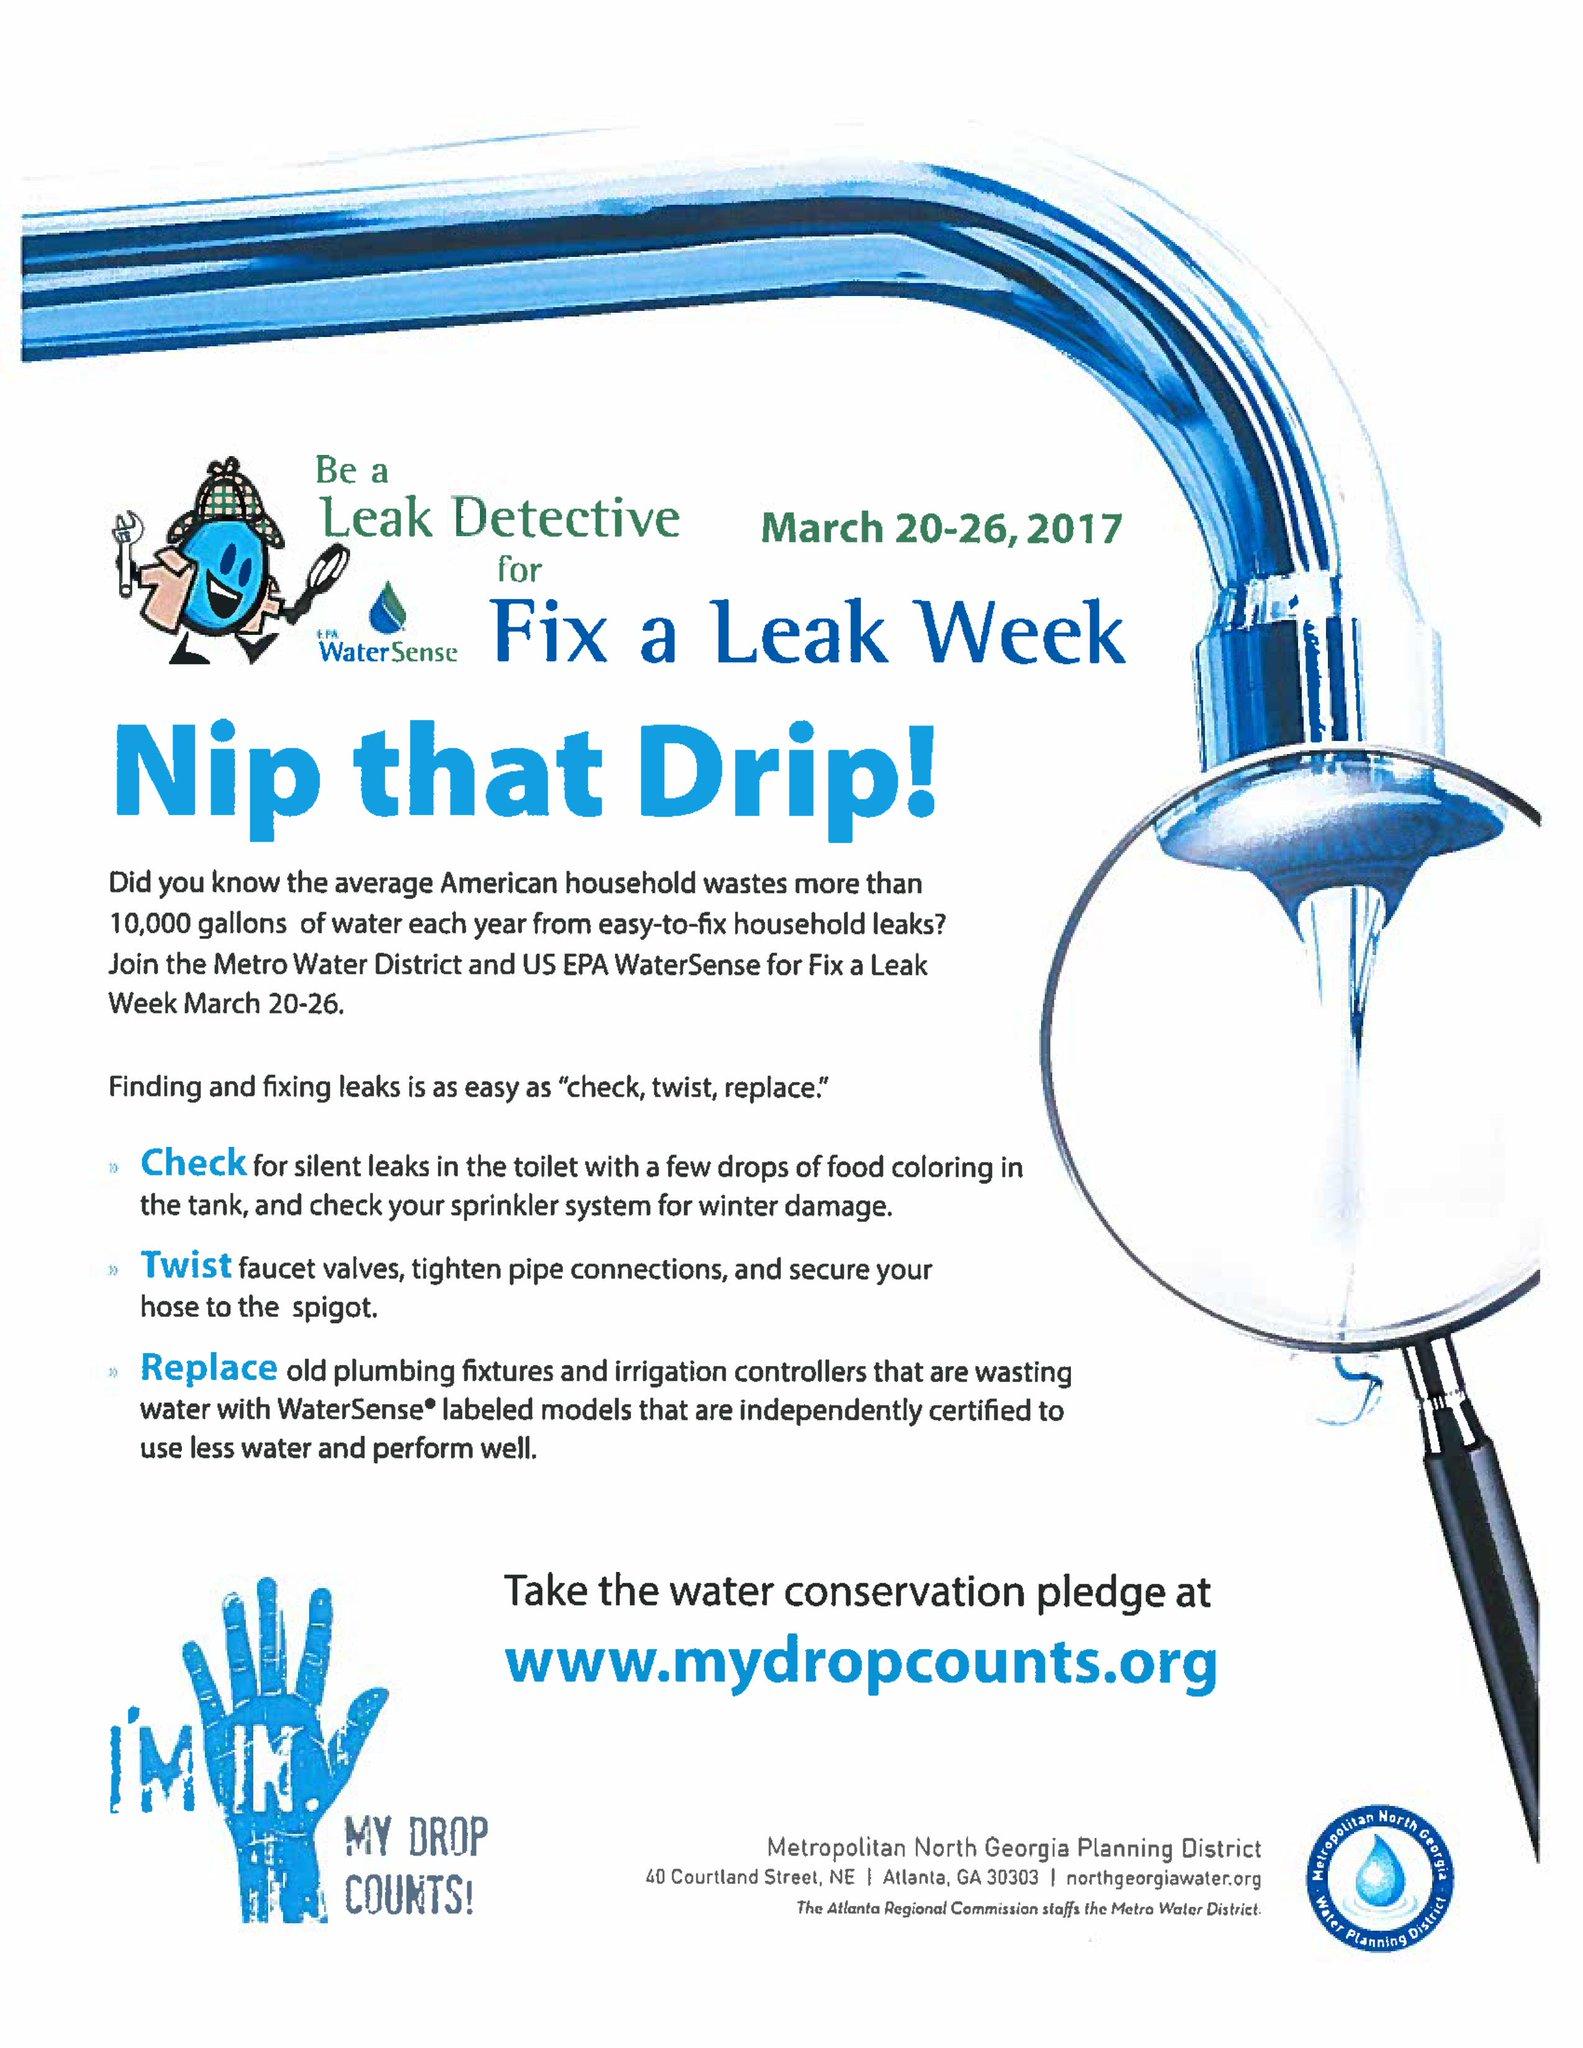 Atlanta Watershed On Twitter Be A Leak Detective And Nip That Drip Fixaleak